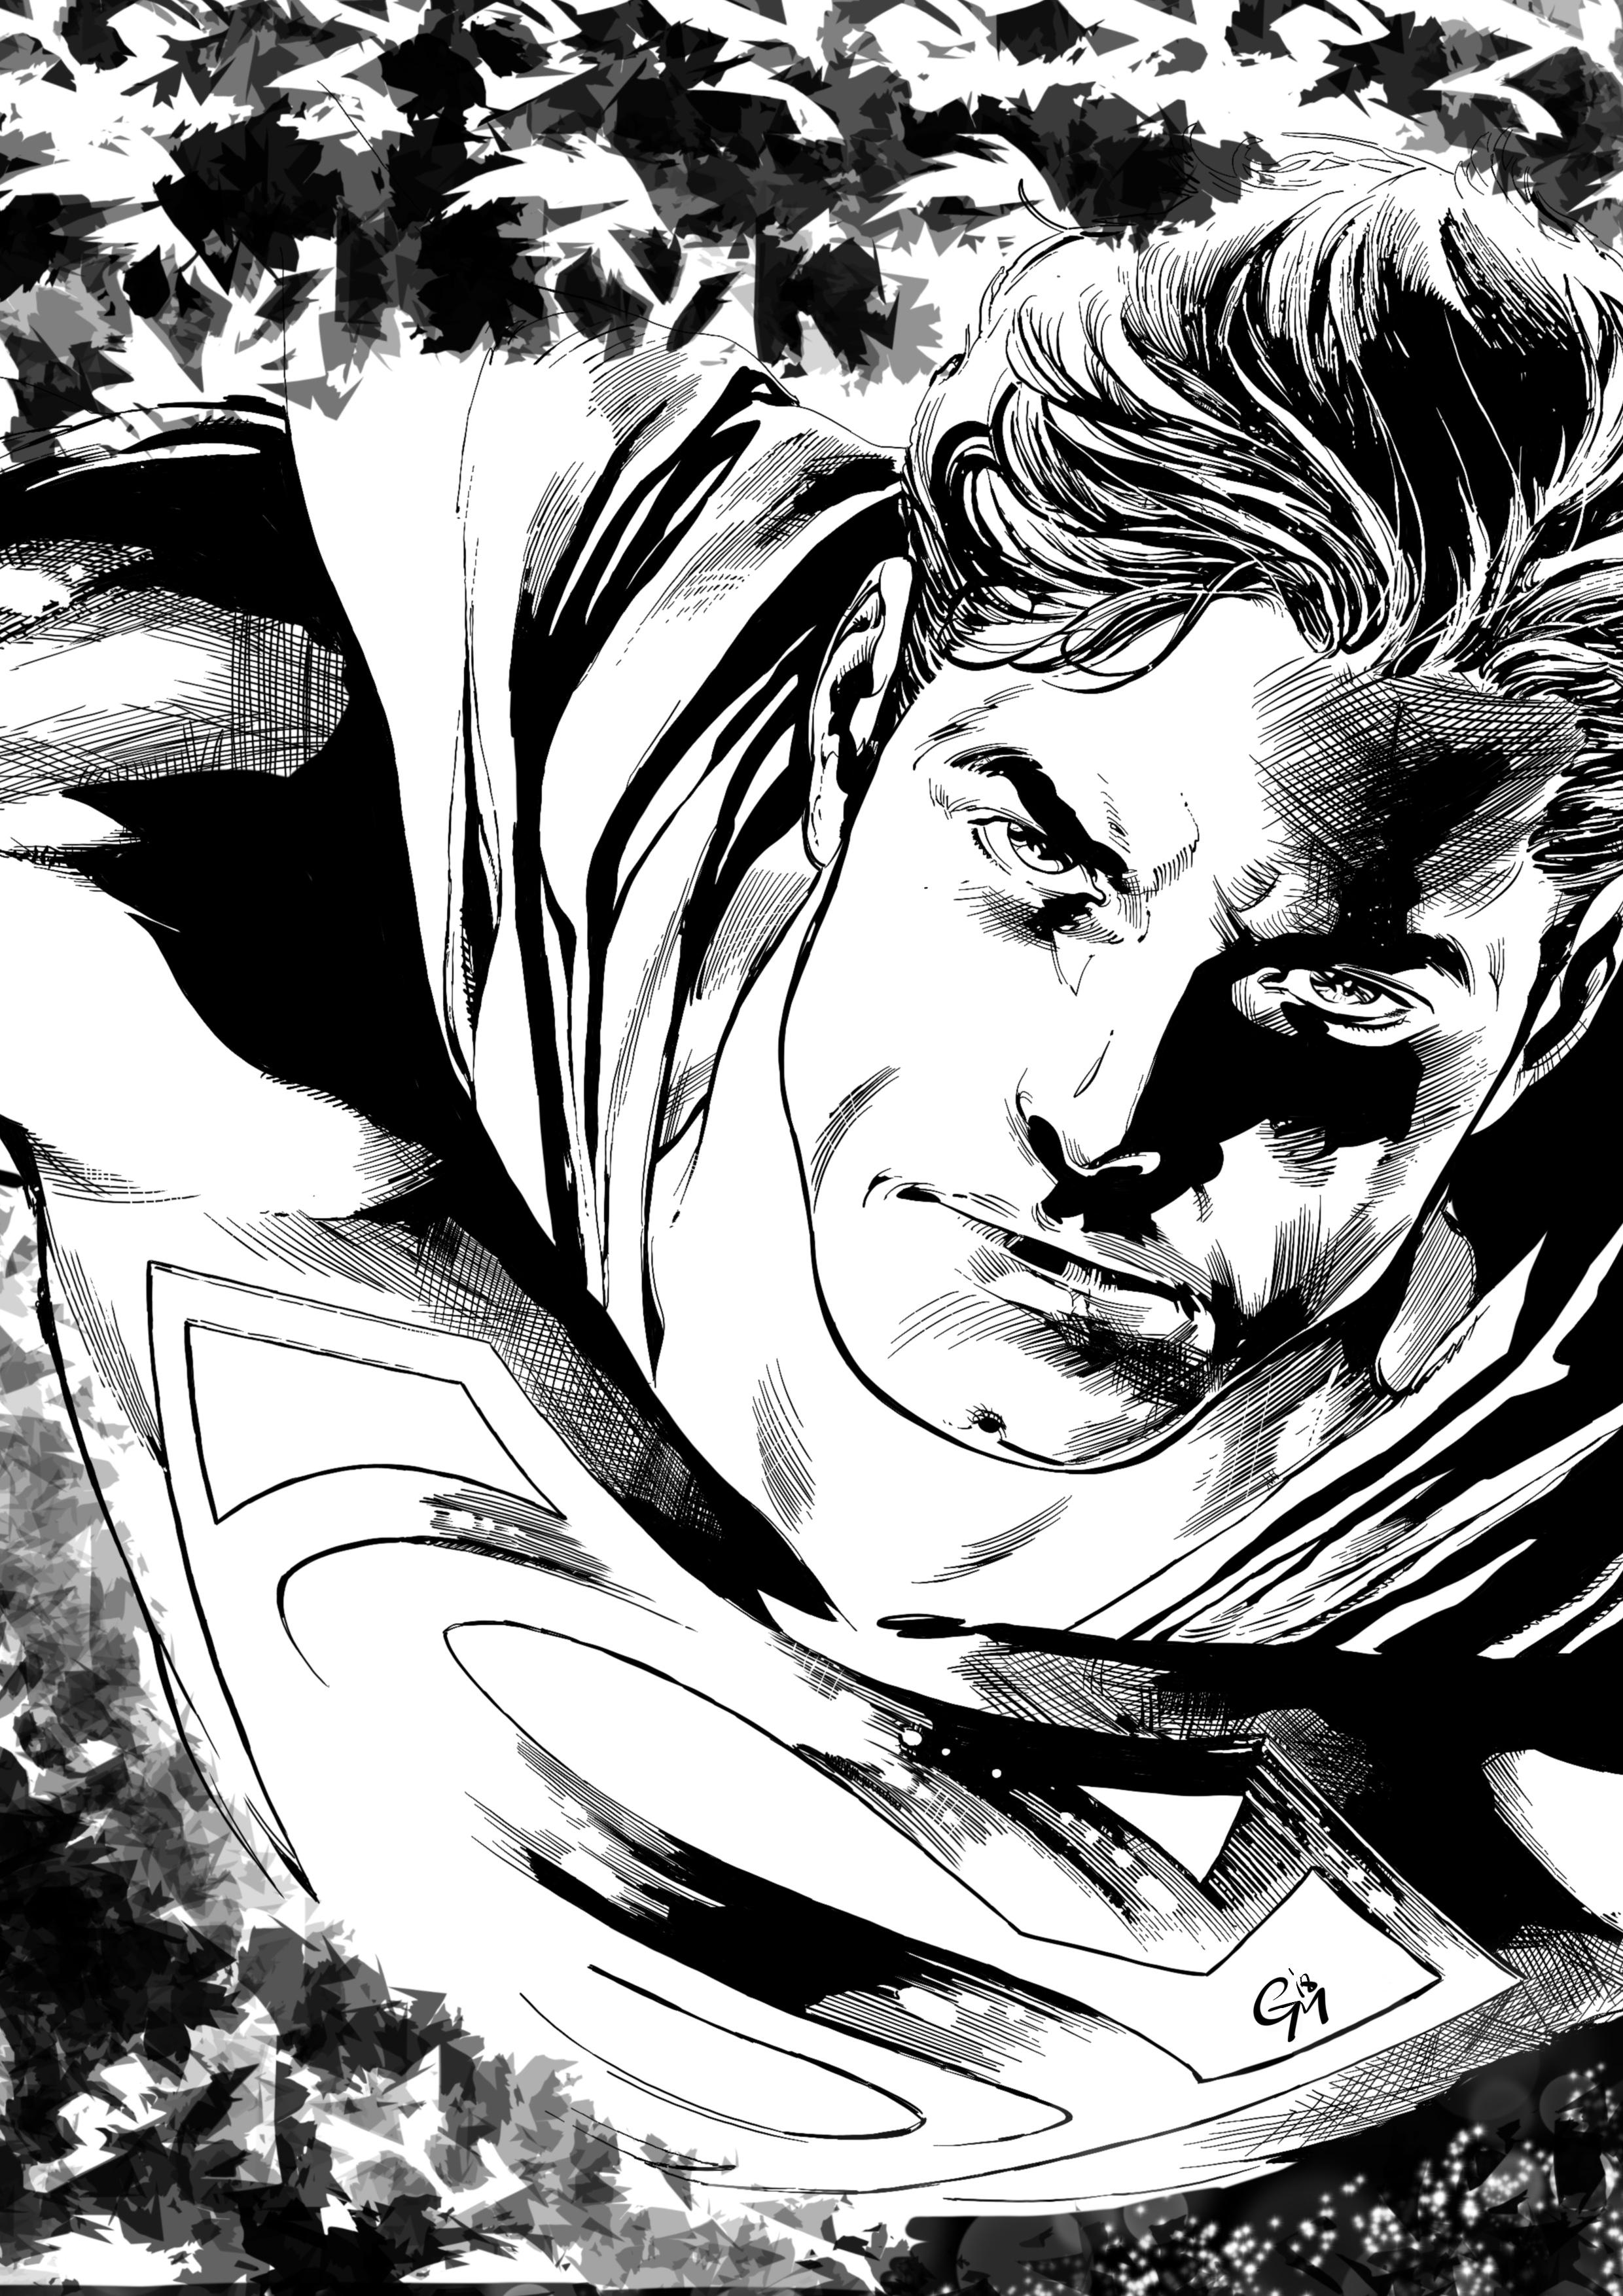 Superman - My inks over Ivan Reis' gorgeous pencils